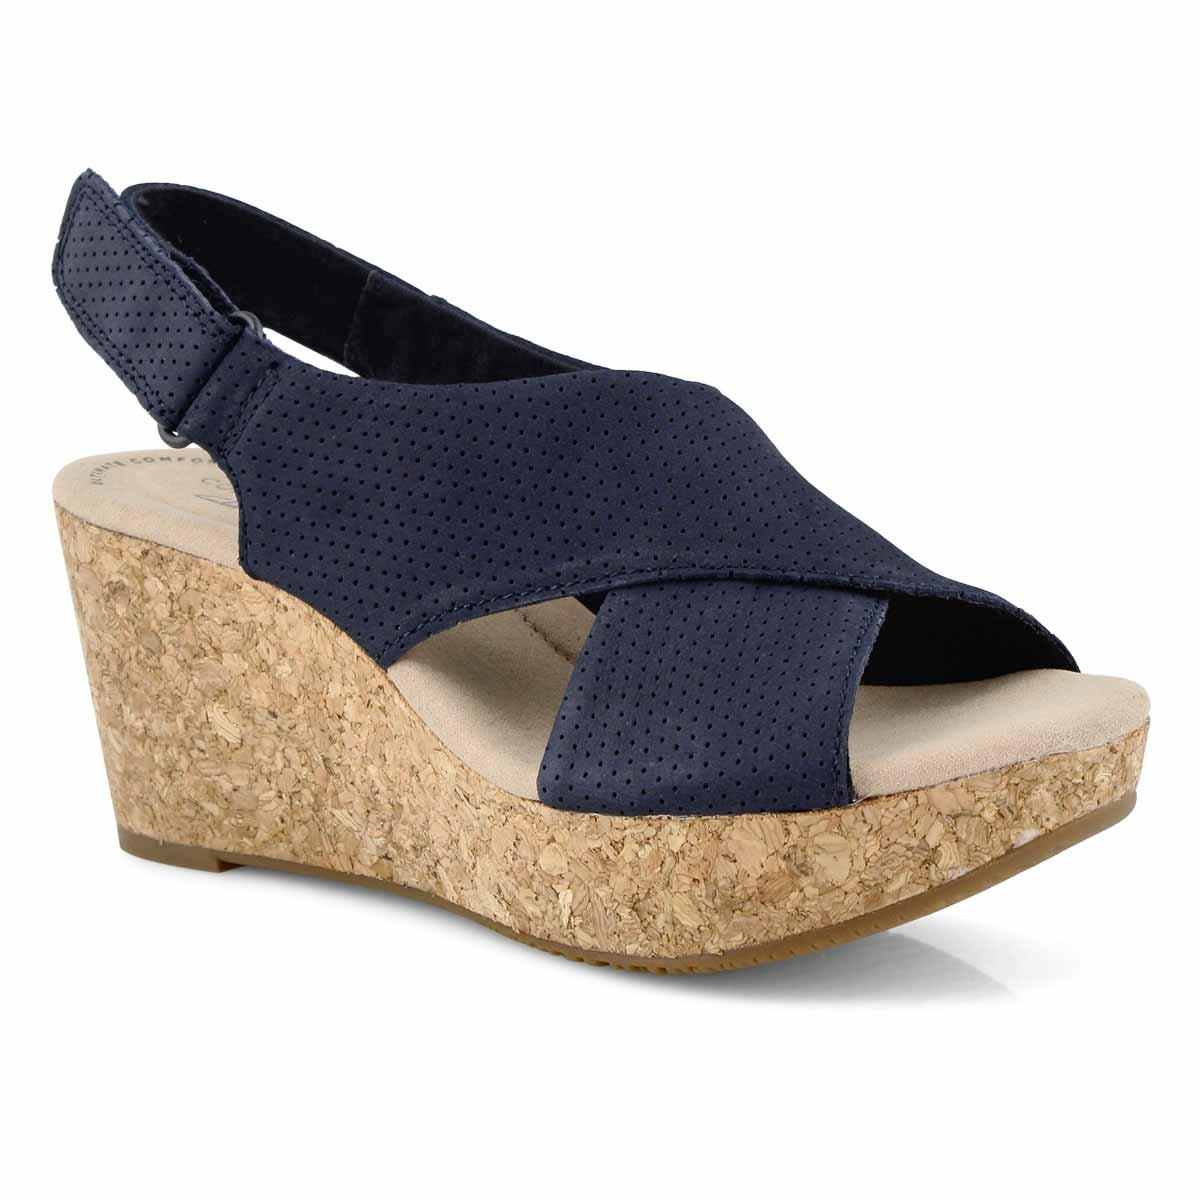 Lds Annadel Parker navy wedge sandal